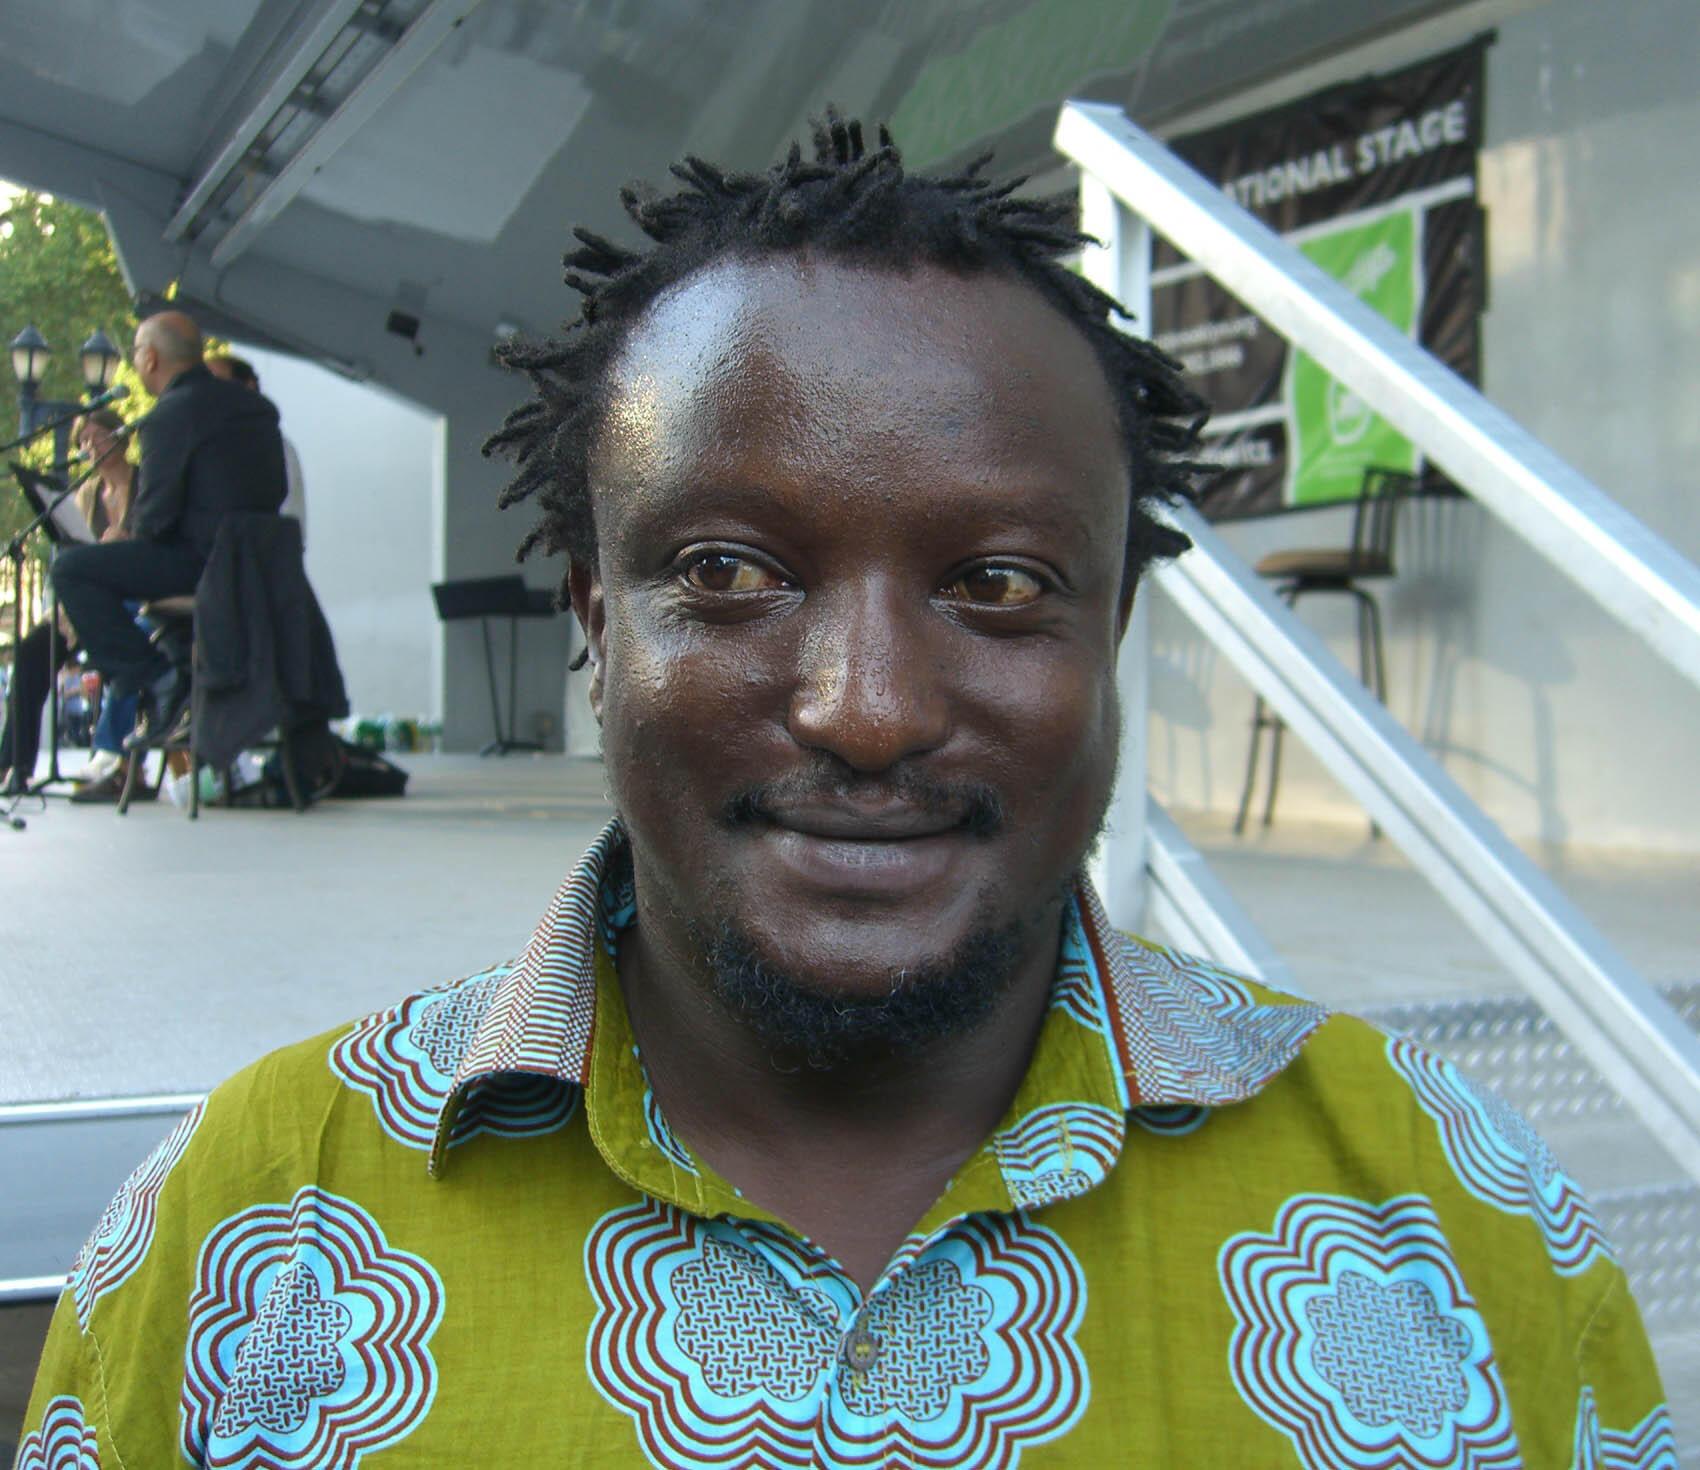 Kenyan writer and LGBTQ activist Binyavanga Wainaina